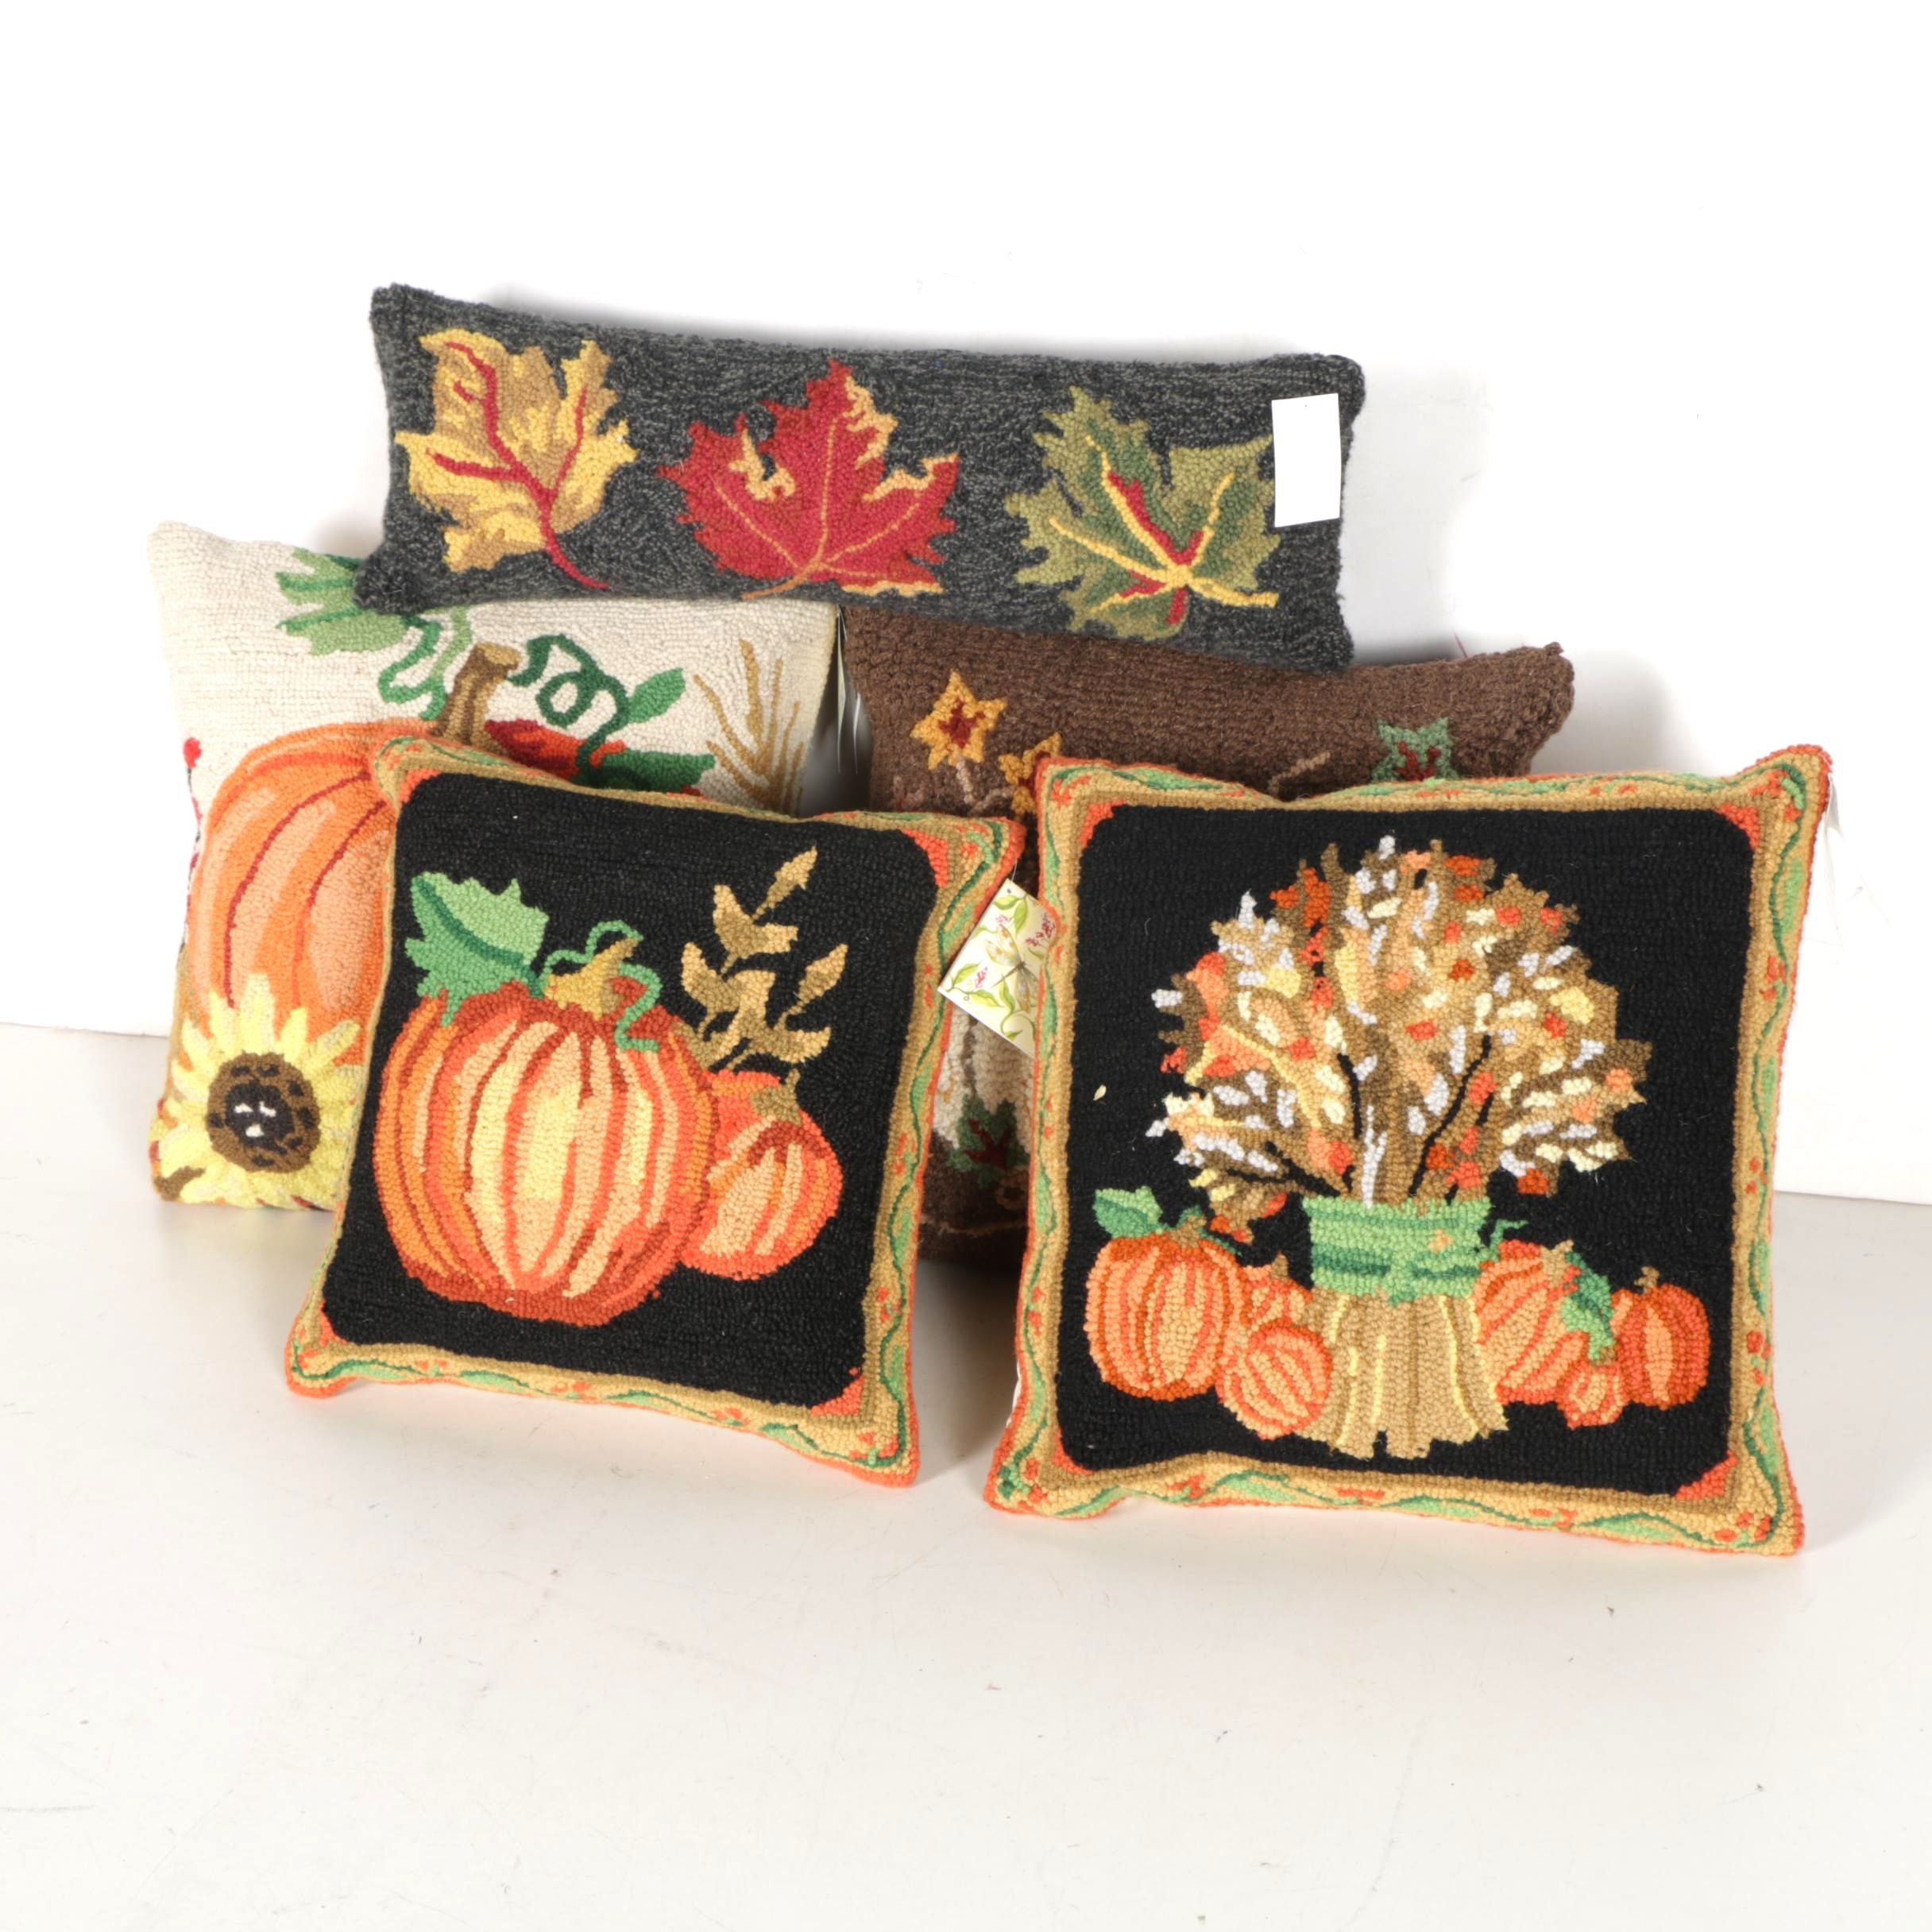 Assortment of Fall Themed Accent Pillows.